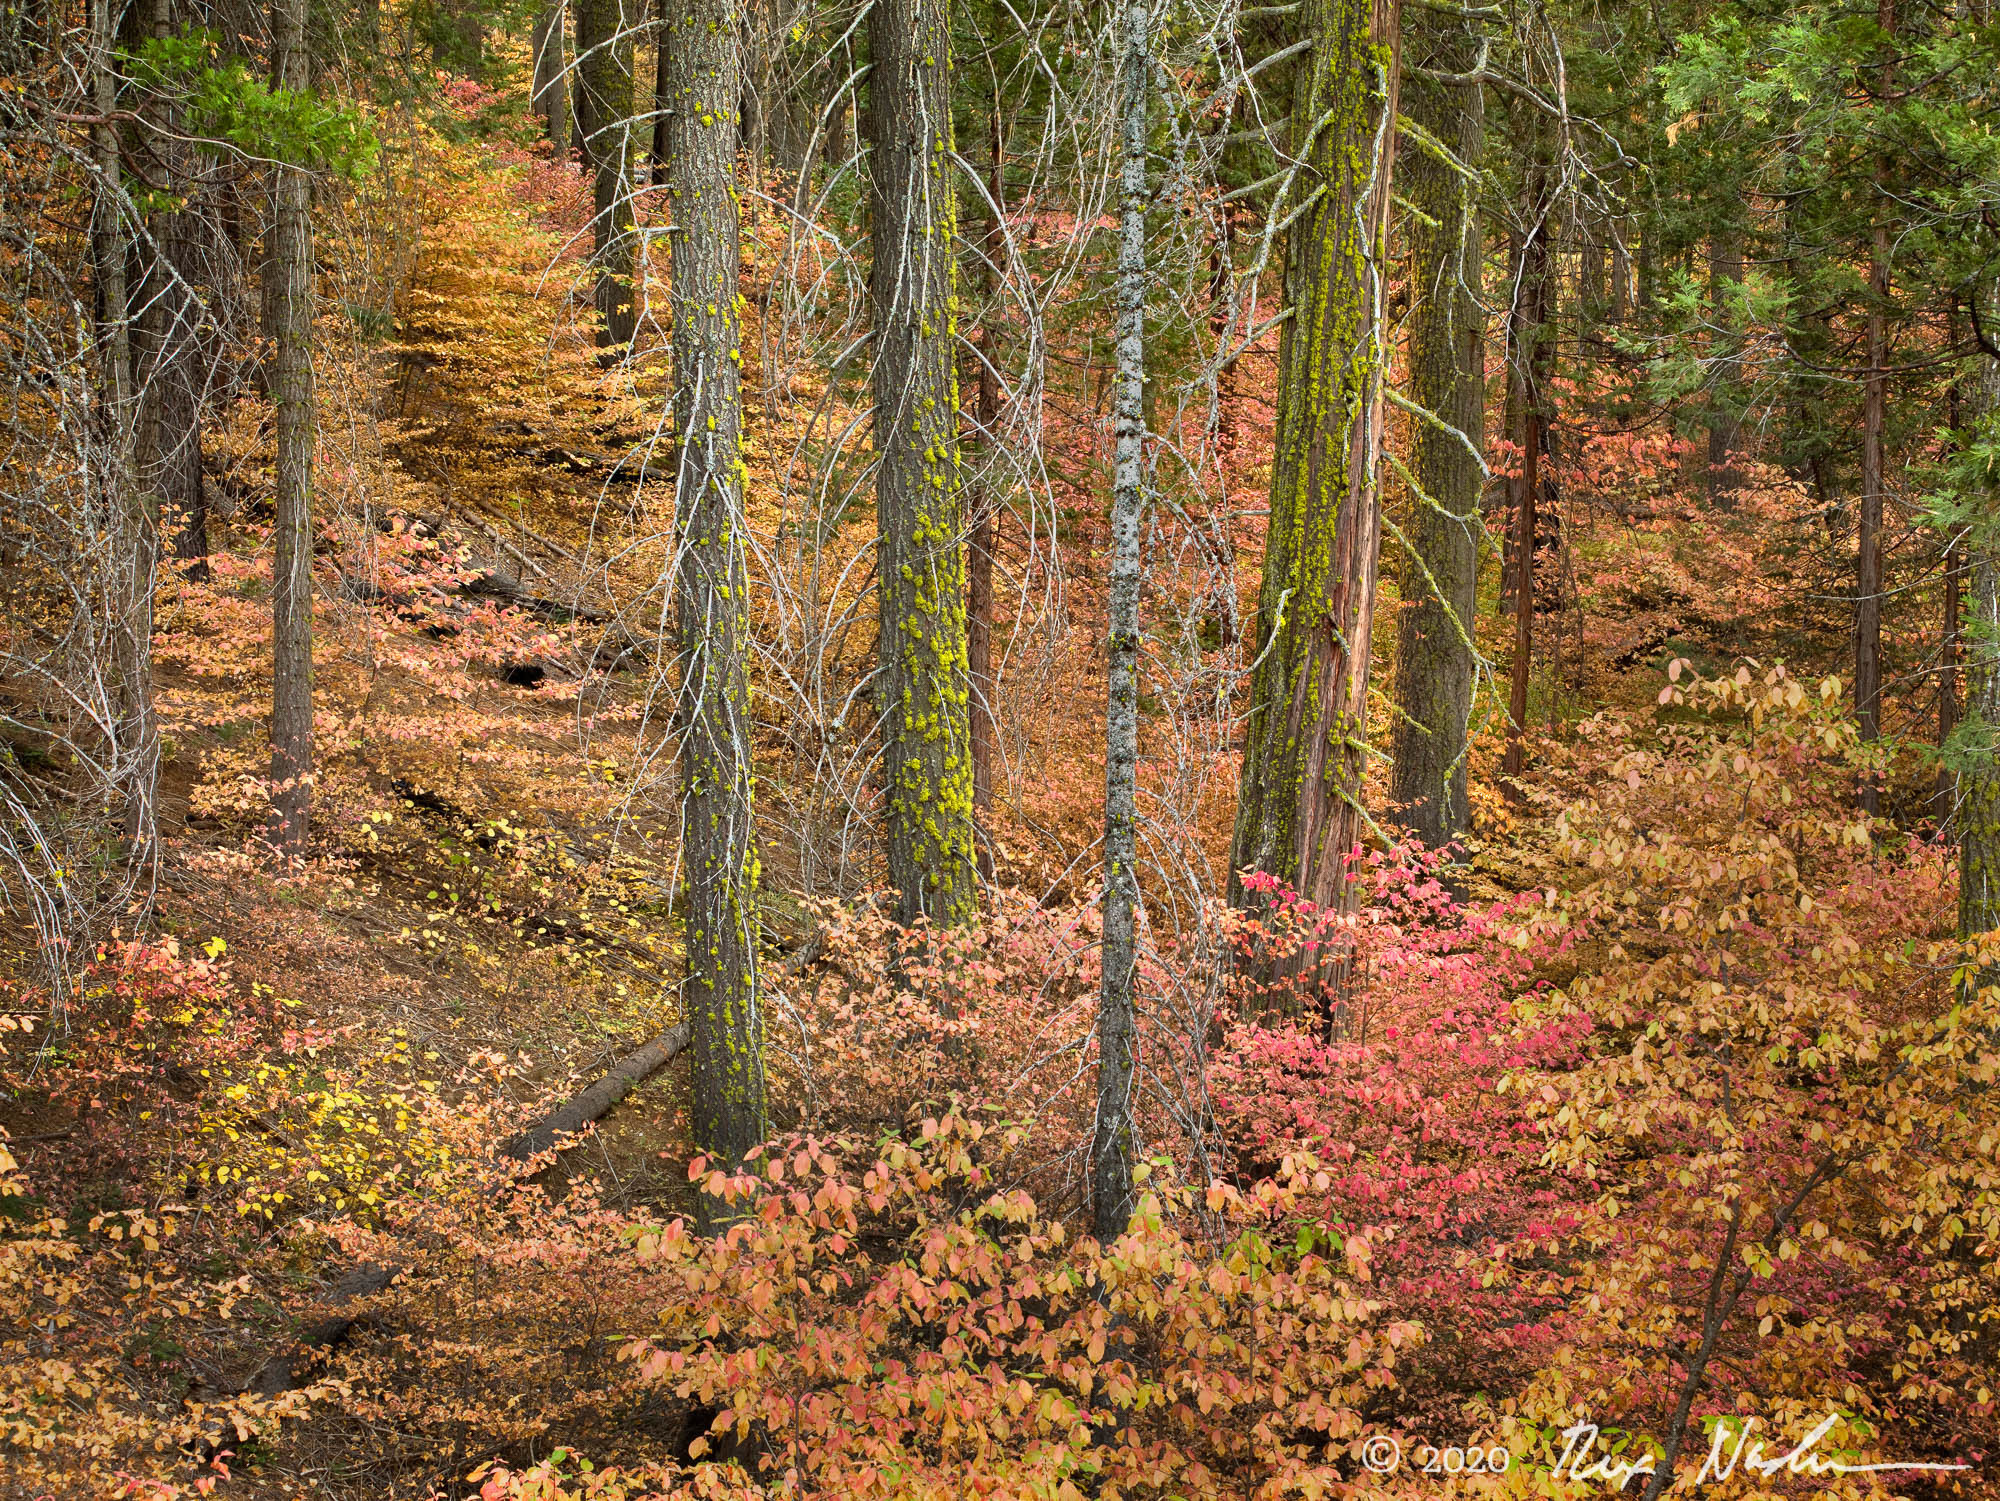 Foret Rouge - Yosemite NP